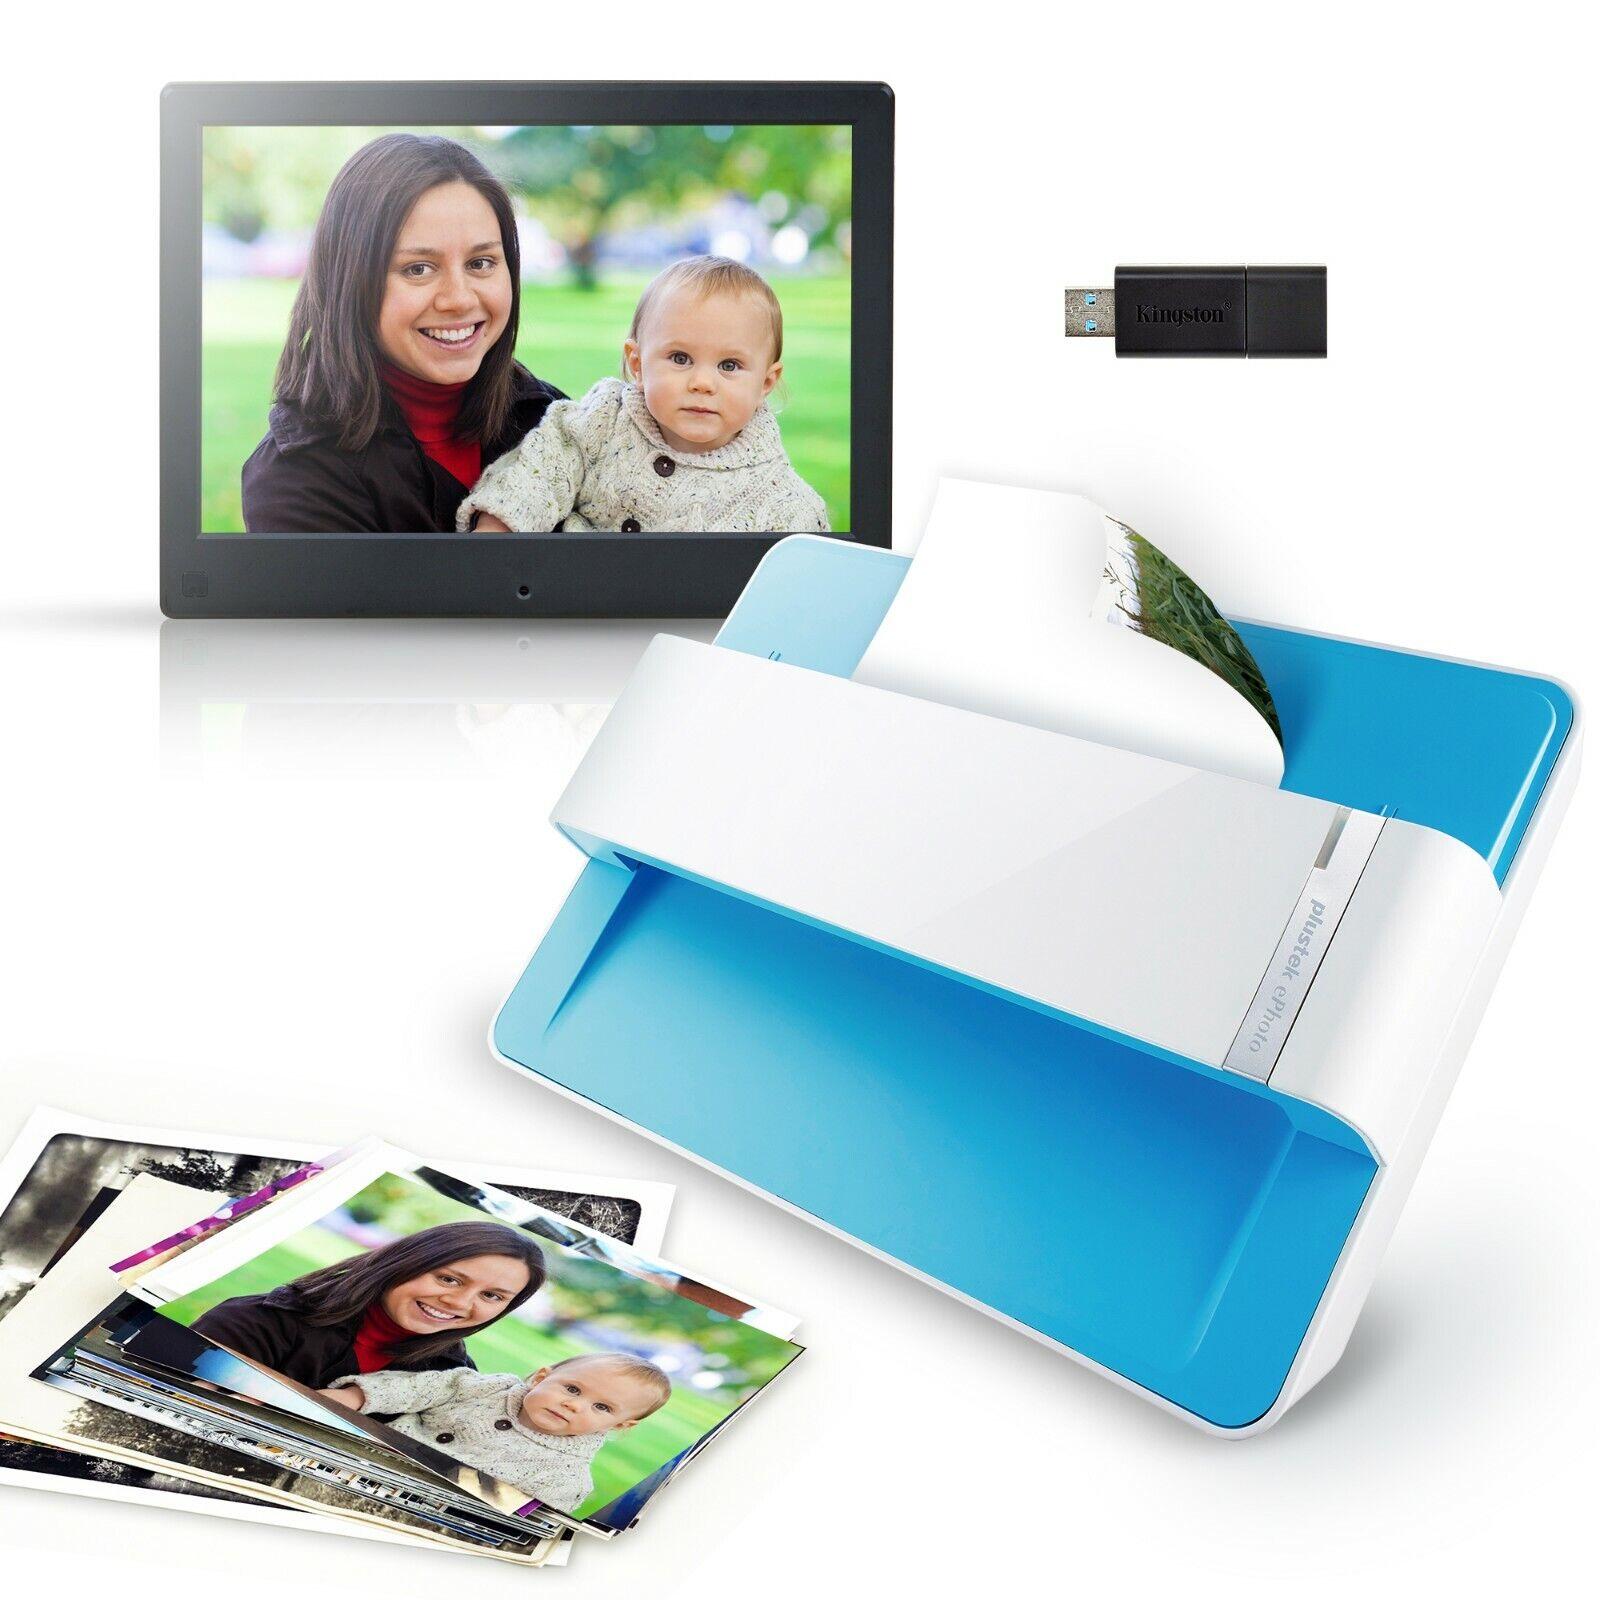 Plustek photo scan kit - Photo scanner + Digital Photo Frame